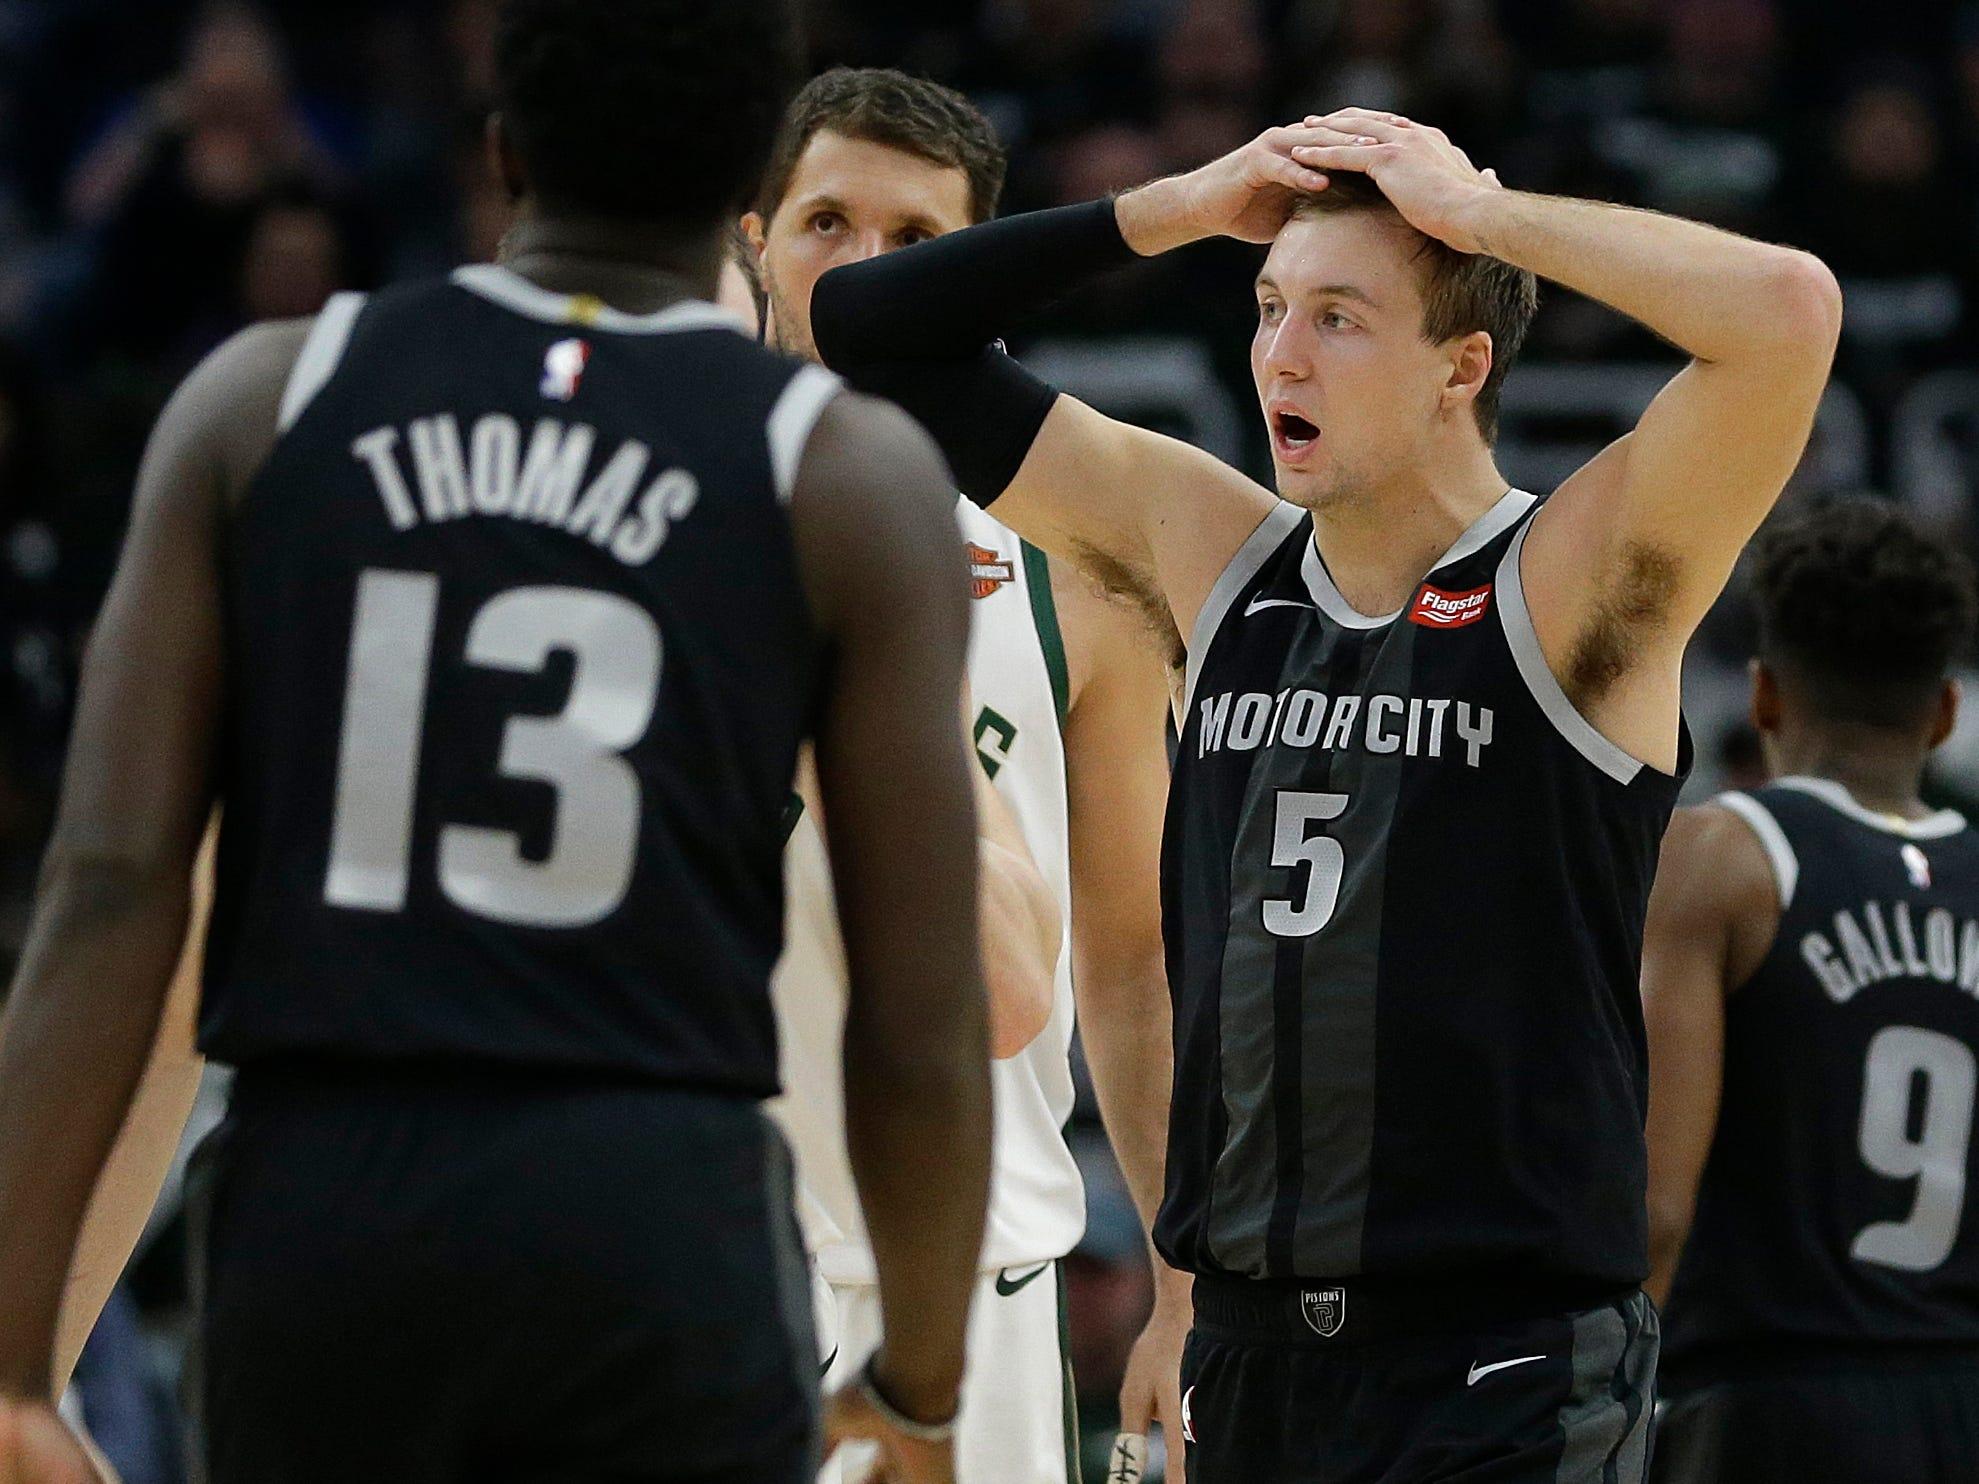 Detroit Pistons' Luke Kennard (5) reacts during the second half of Game 1 against the Milwaukee Bucks, Sunday, April 14, 2019, in Milwaukee. The Bucks won 121-86.